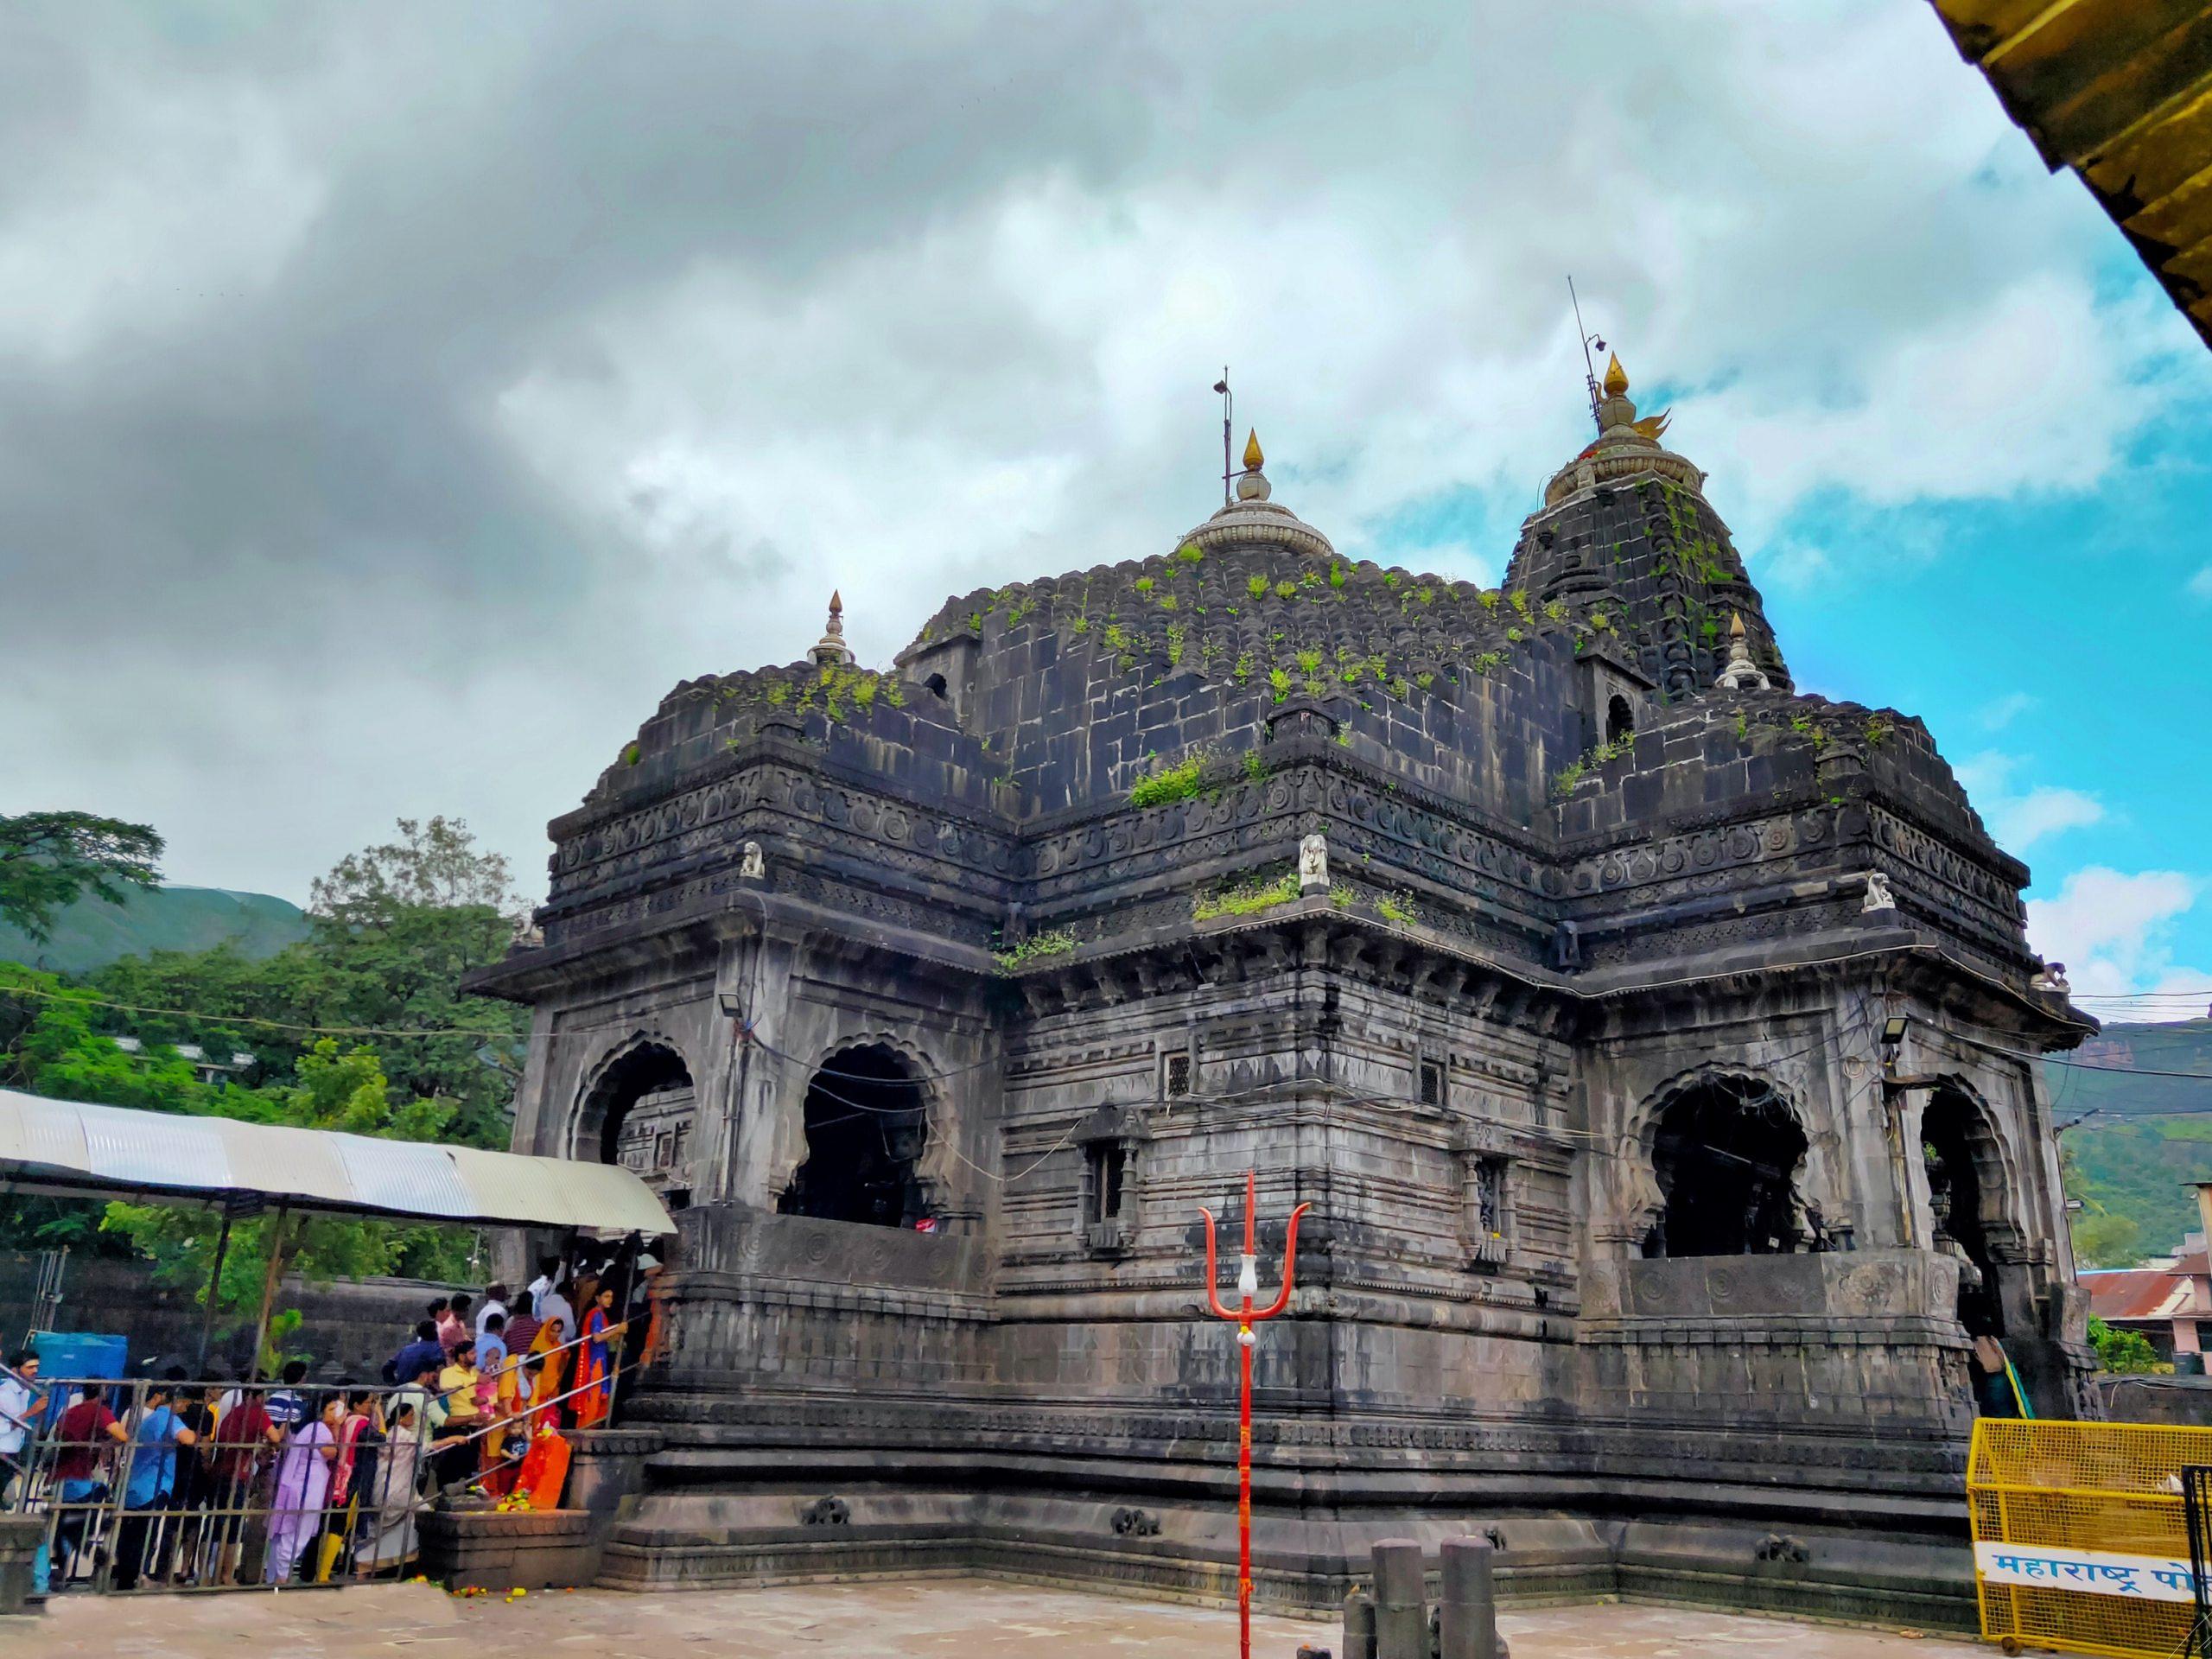 An old Hindu temple